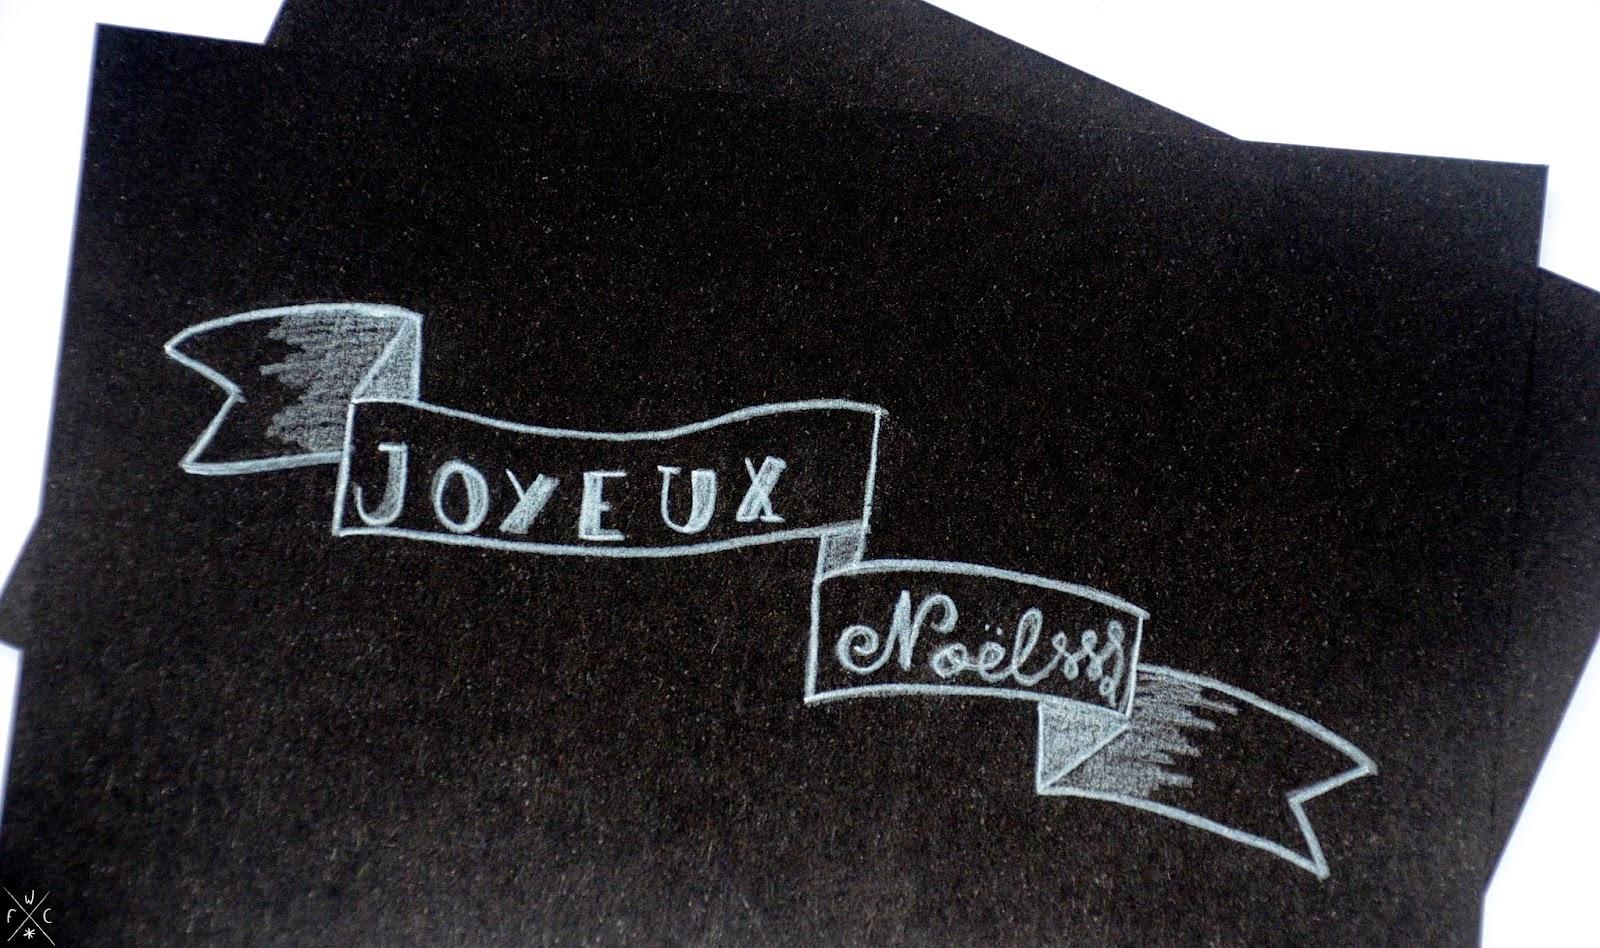 http://www.far-west-coast.com/2014/12/joyeux-noel-vives-les-vacances.html